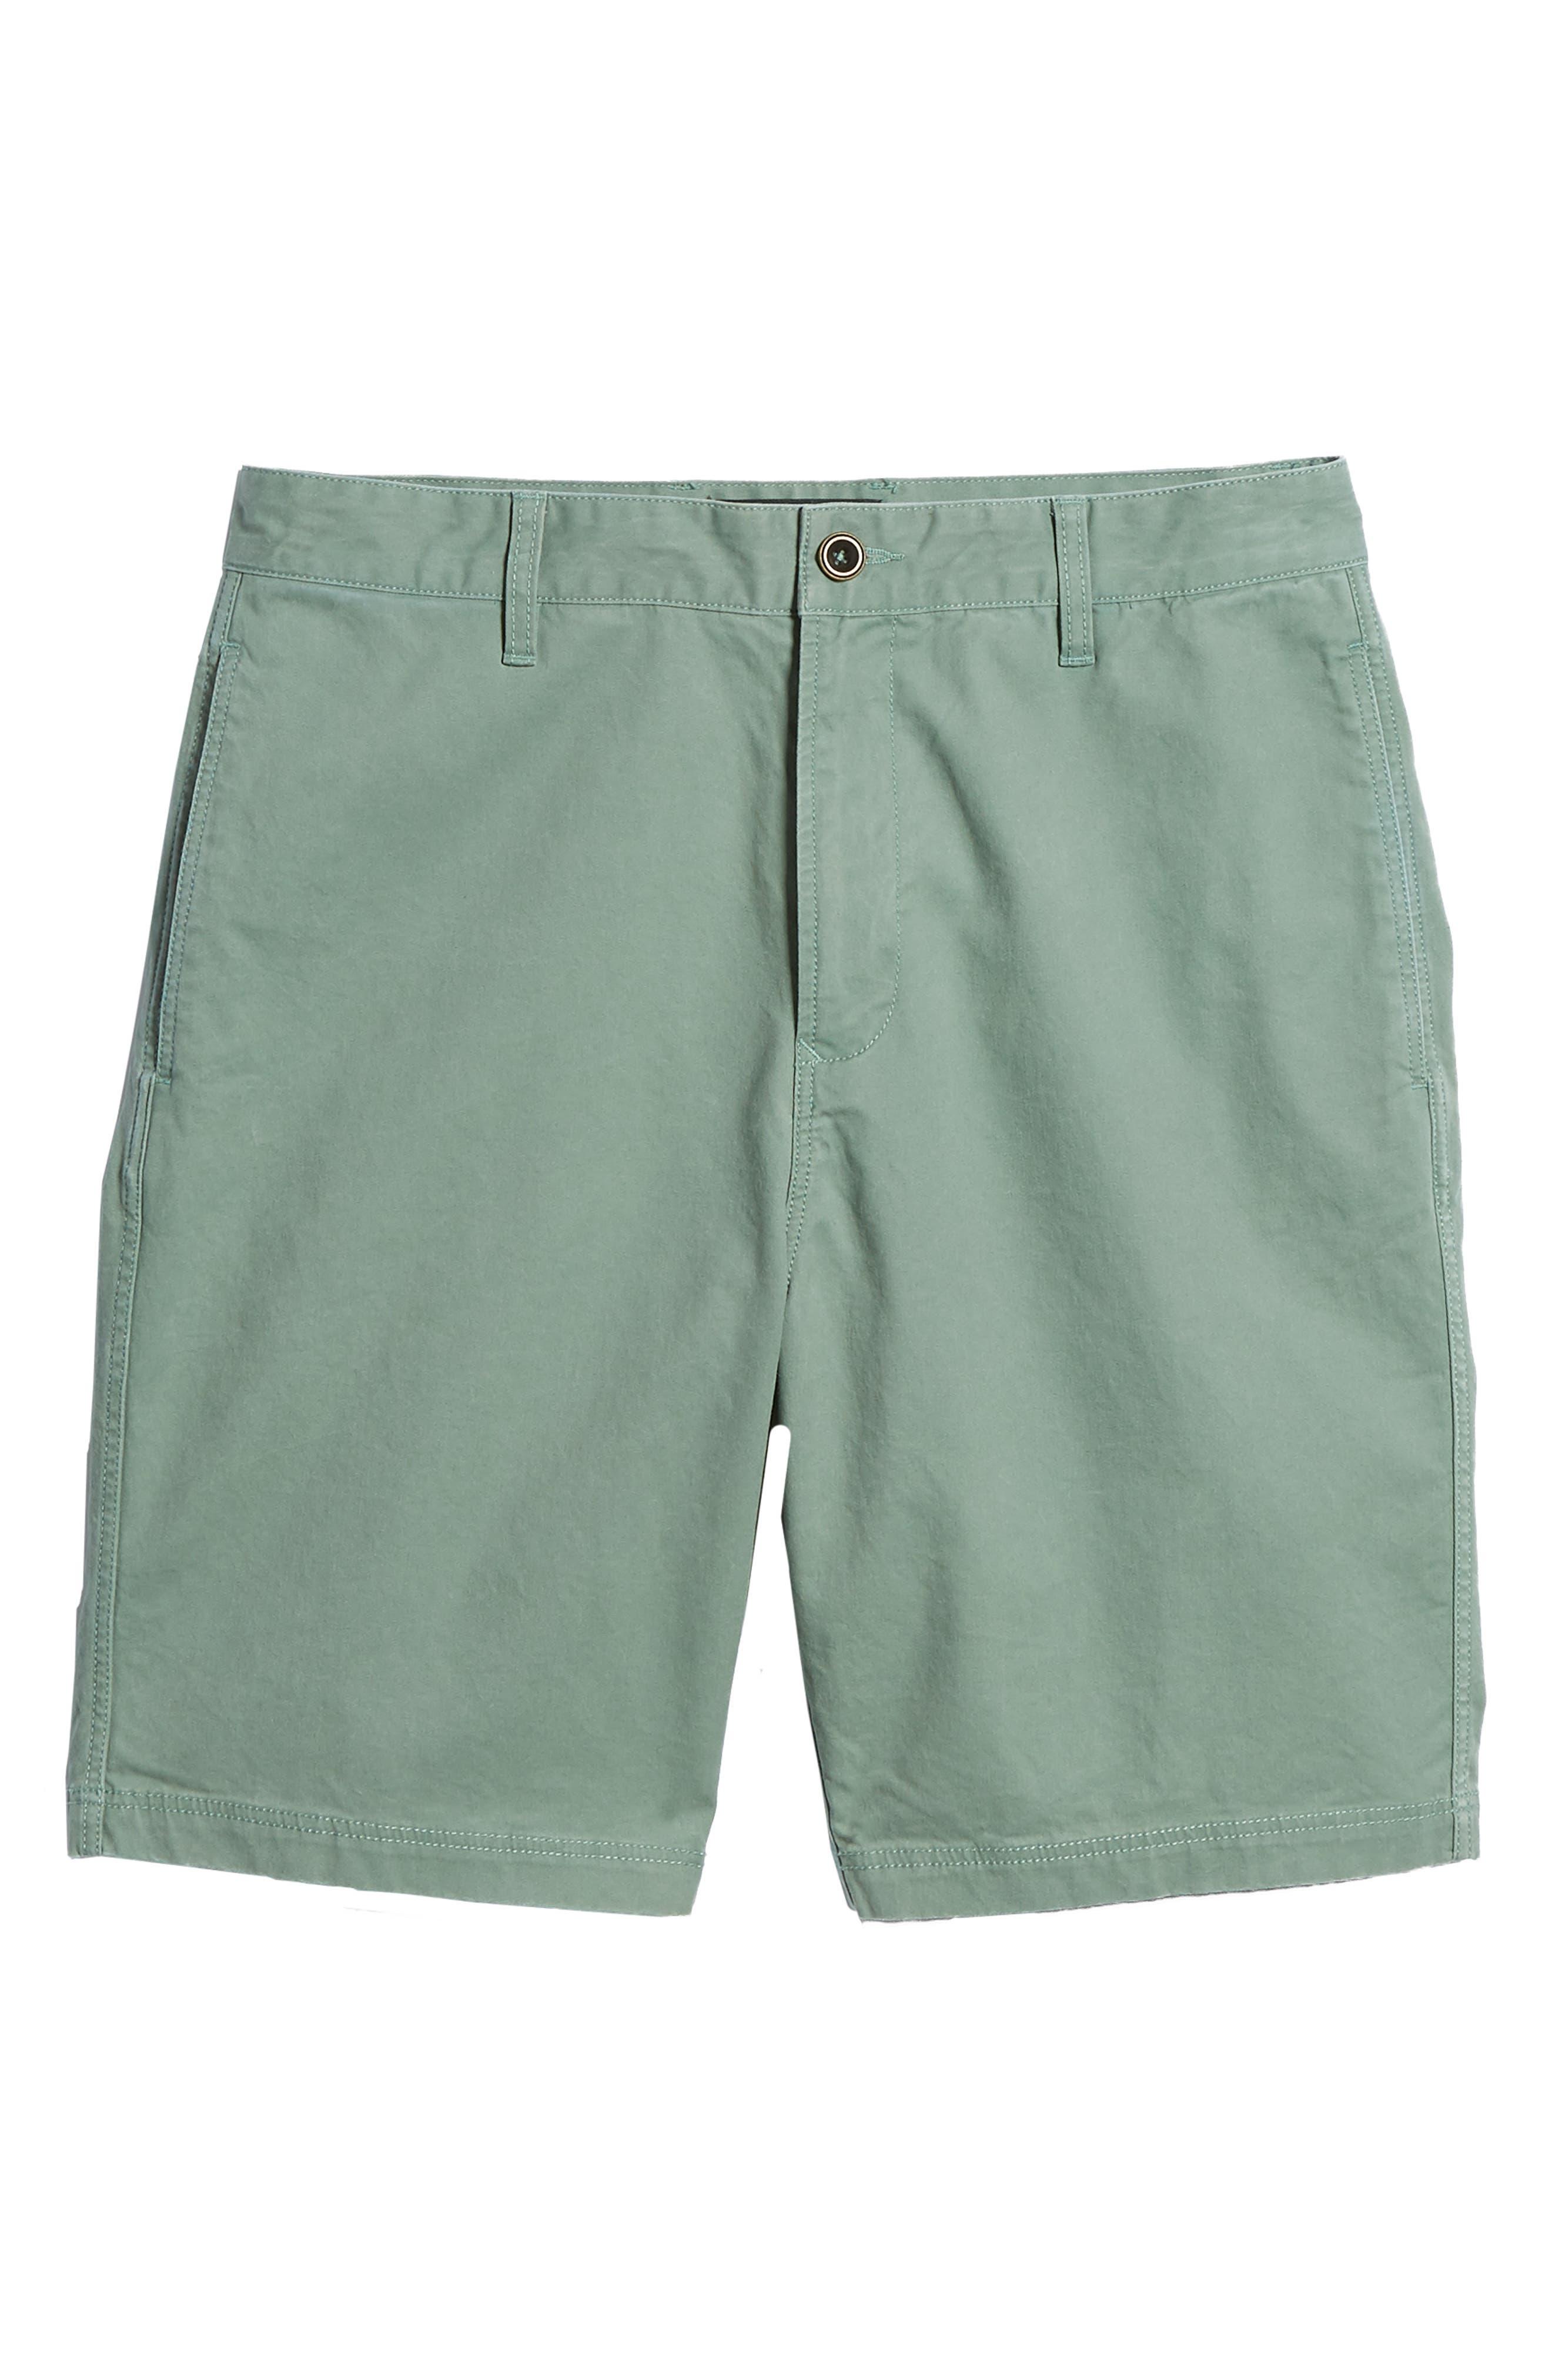 Glenburn Shorts,                             Alternate thumbnail 6, color,                             SAGE